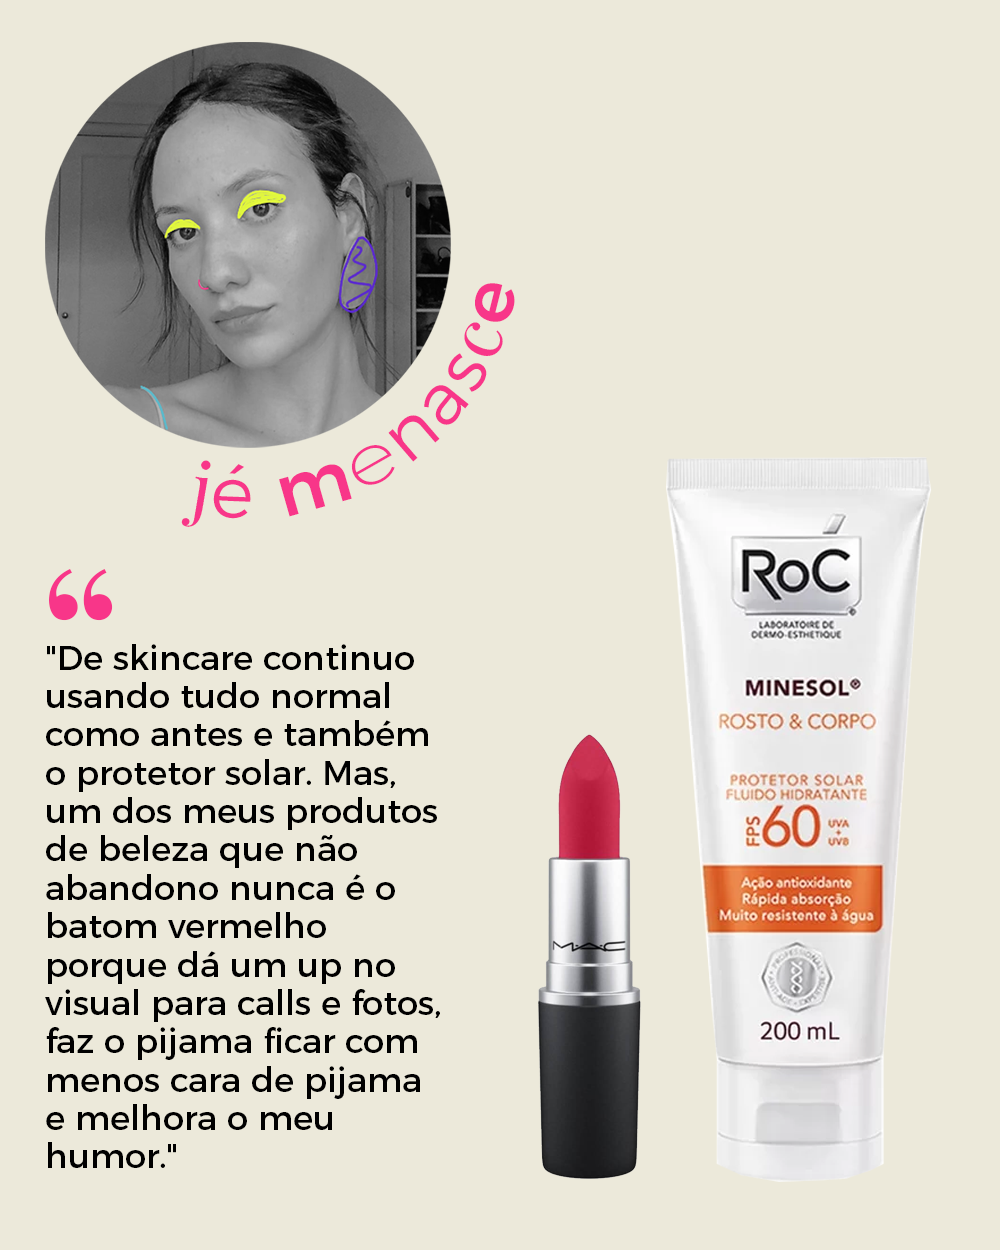 Jéssica Menasce - produtos de beleza -     -     -      - https://stealthelook.com.br